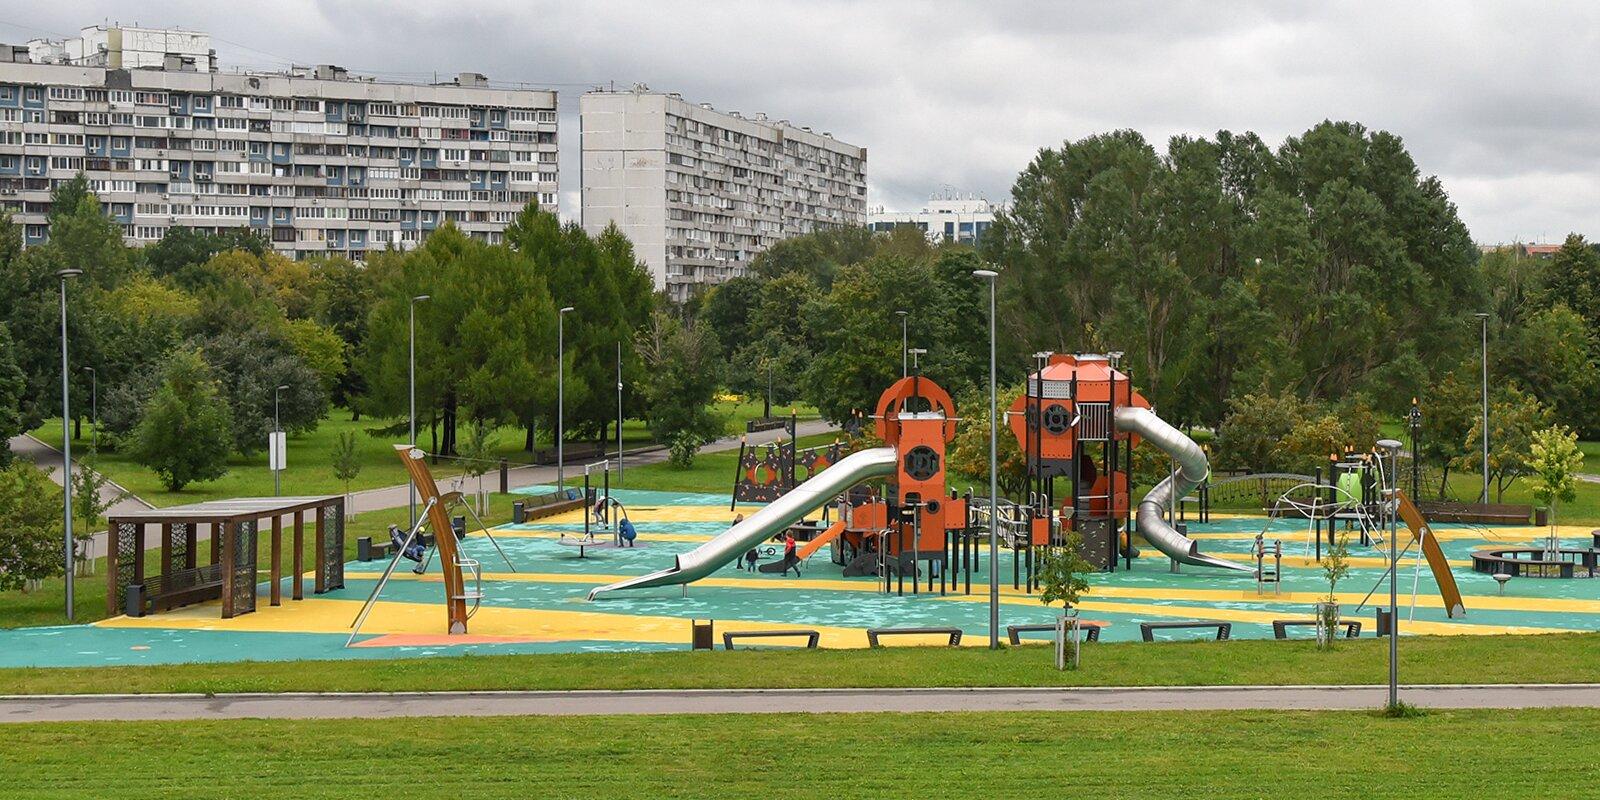 Парк «Садовники» переименуют в парк имени Юрия Лужкова